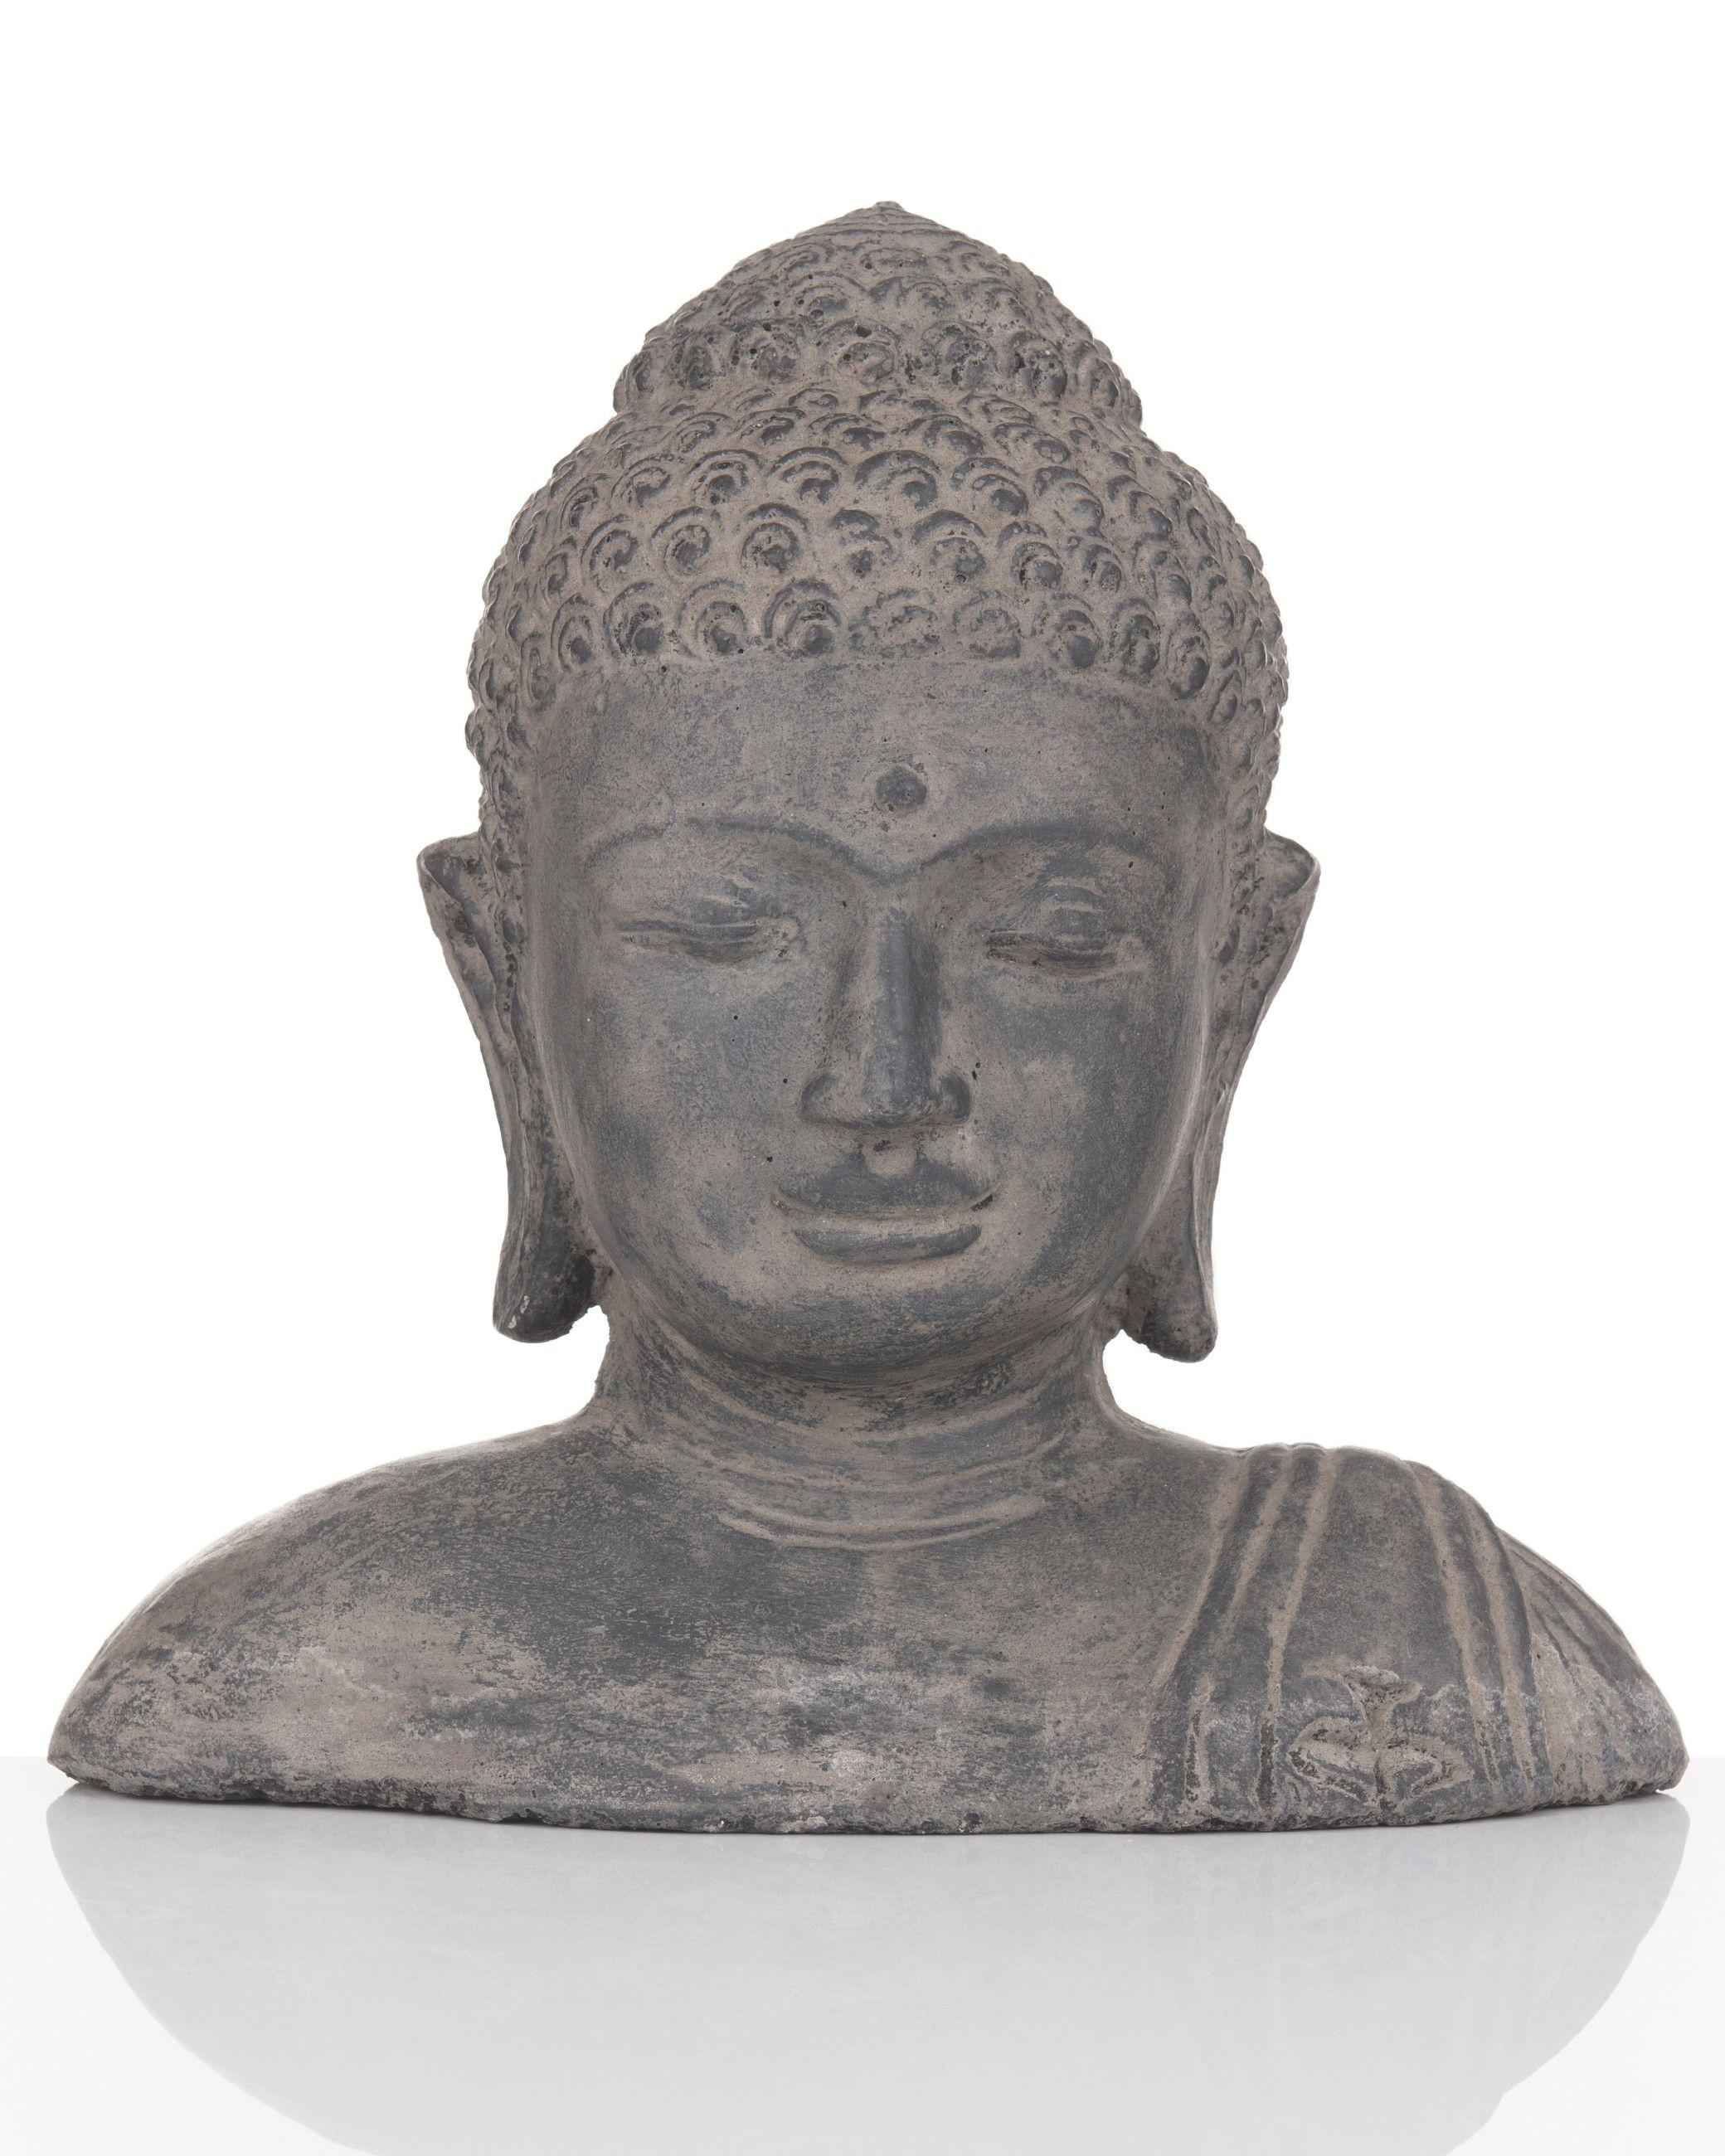 Darimana Buddha Buste Bemalt Aus Sandguss Hse24 Wohnen